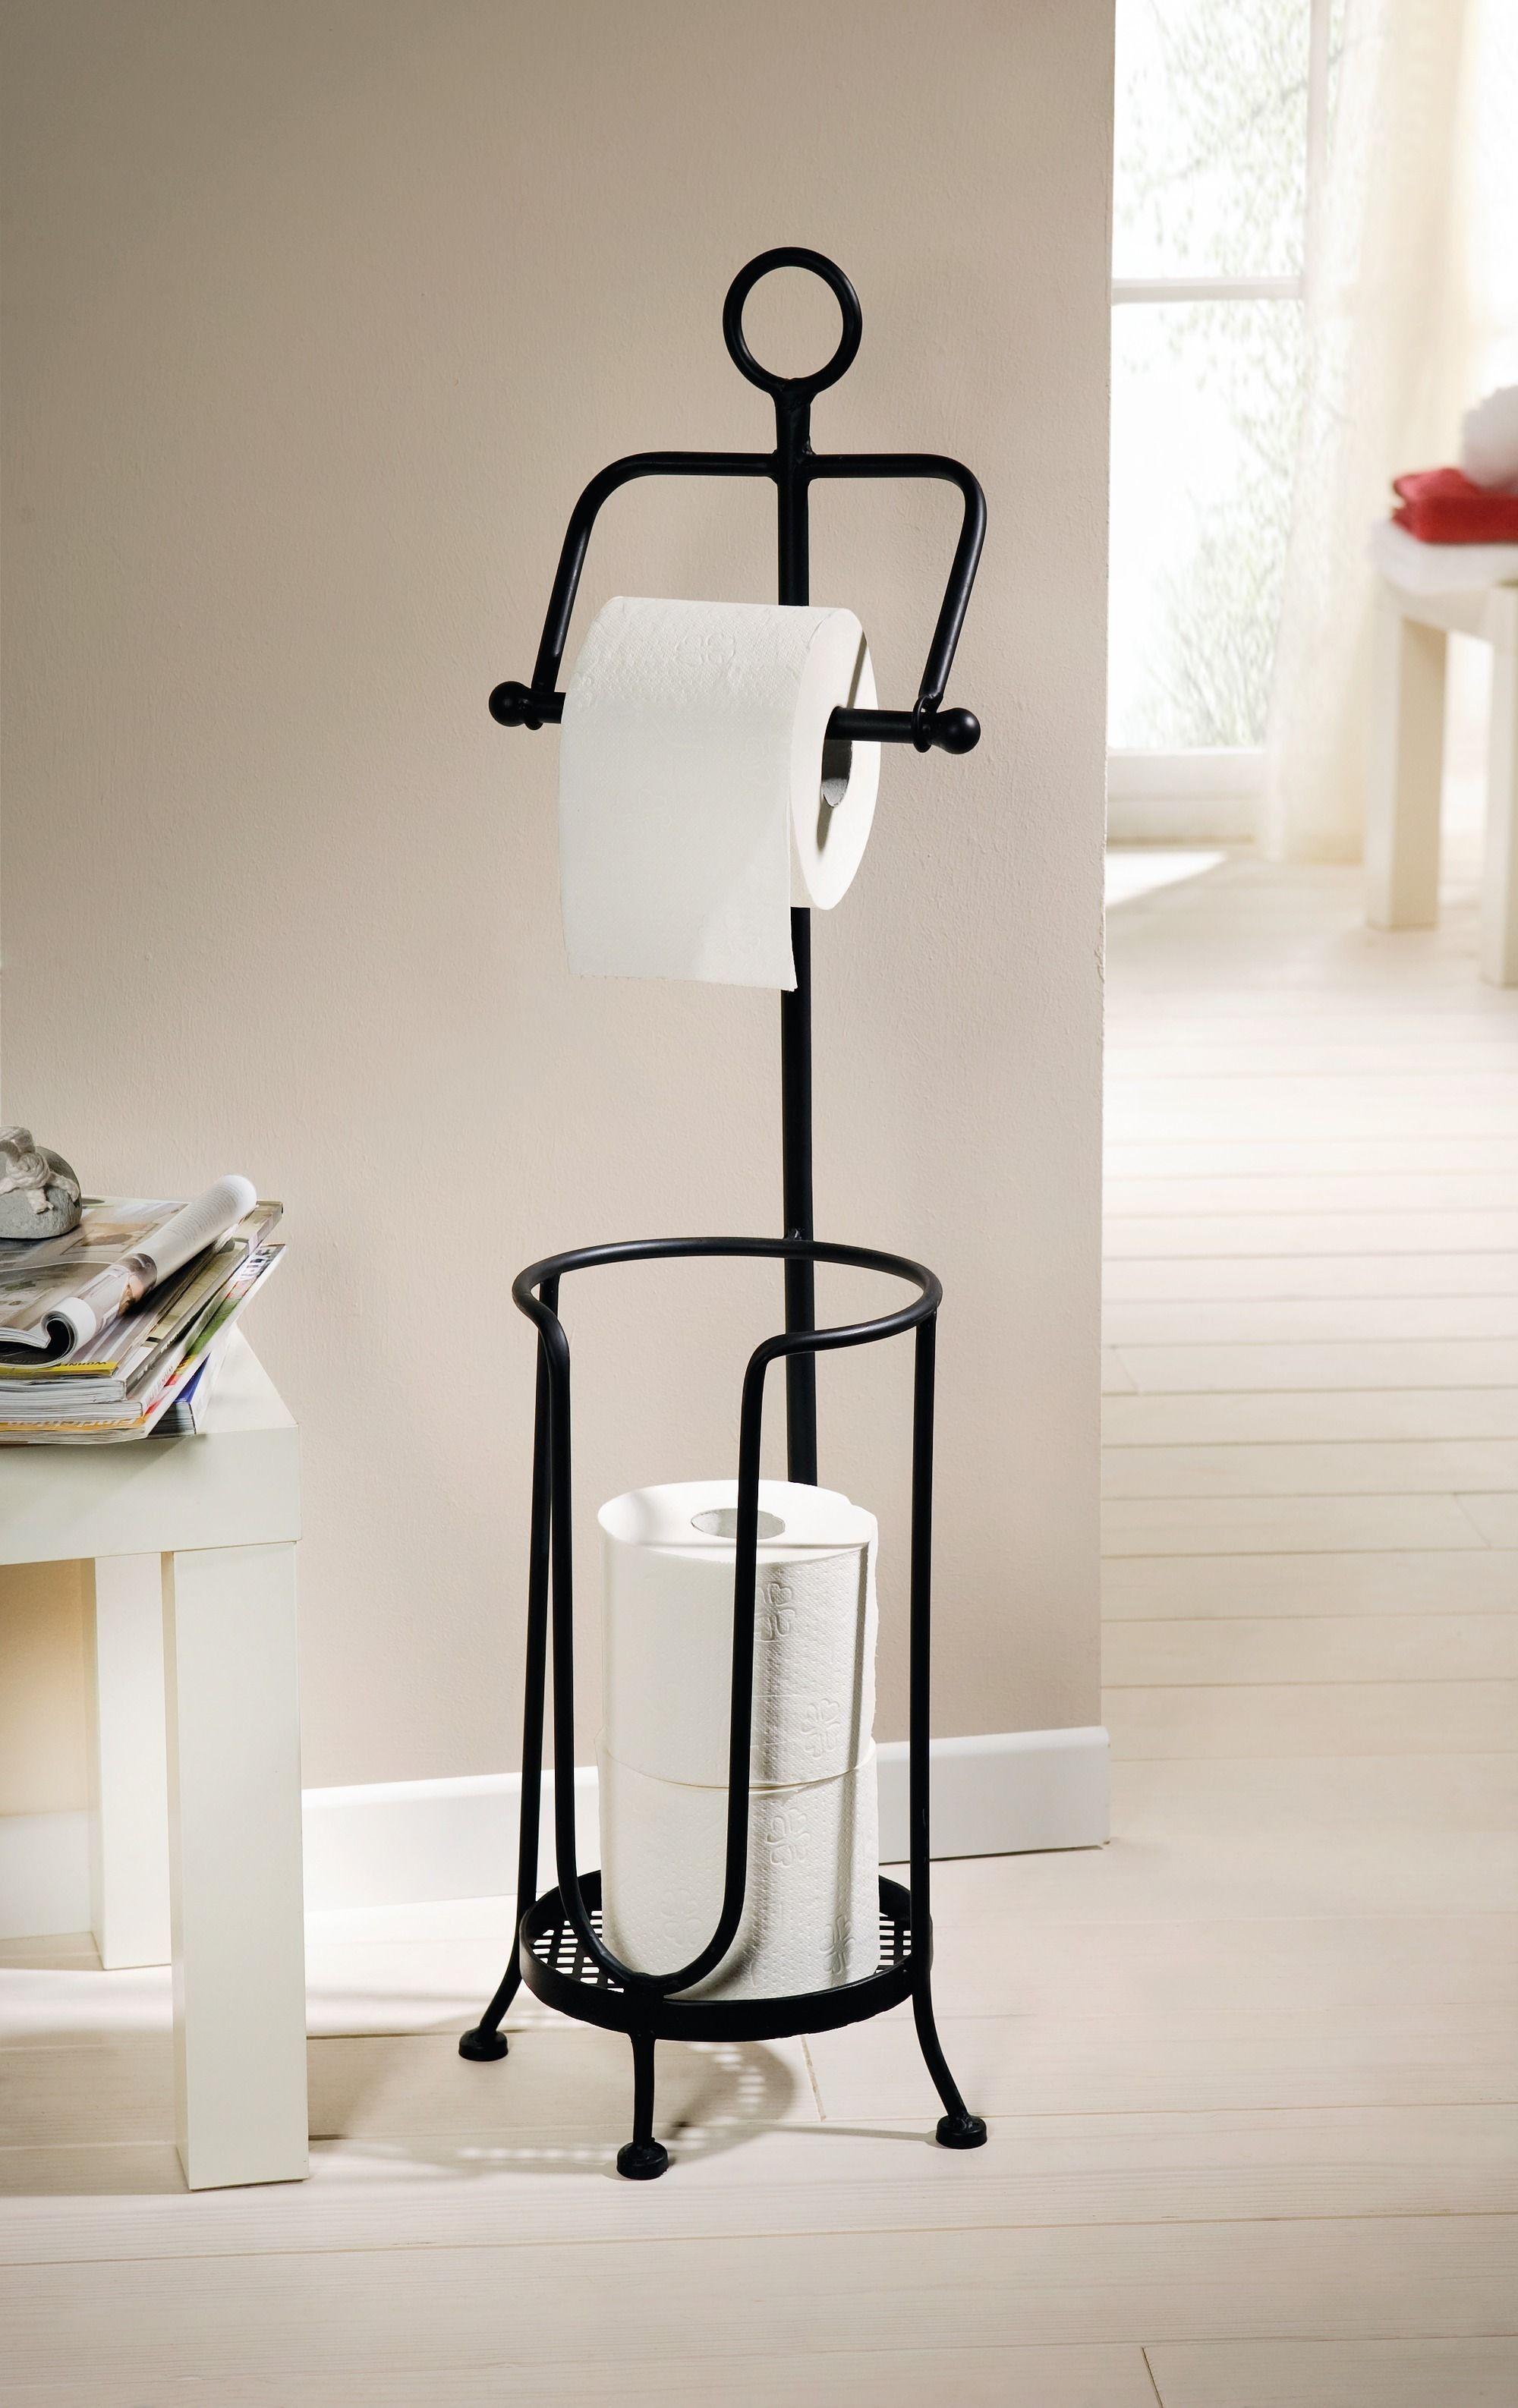 Toilettenpapierhalter Toilettenpapierhalter Toilettenpapier Stander Papierhalter